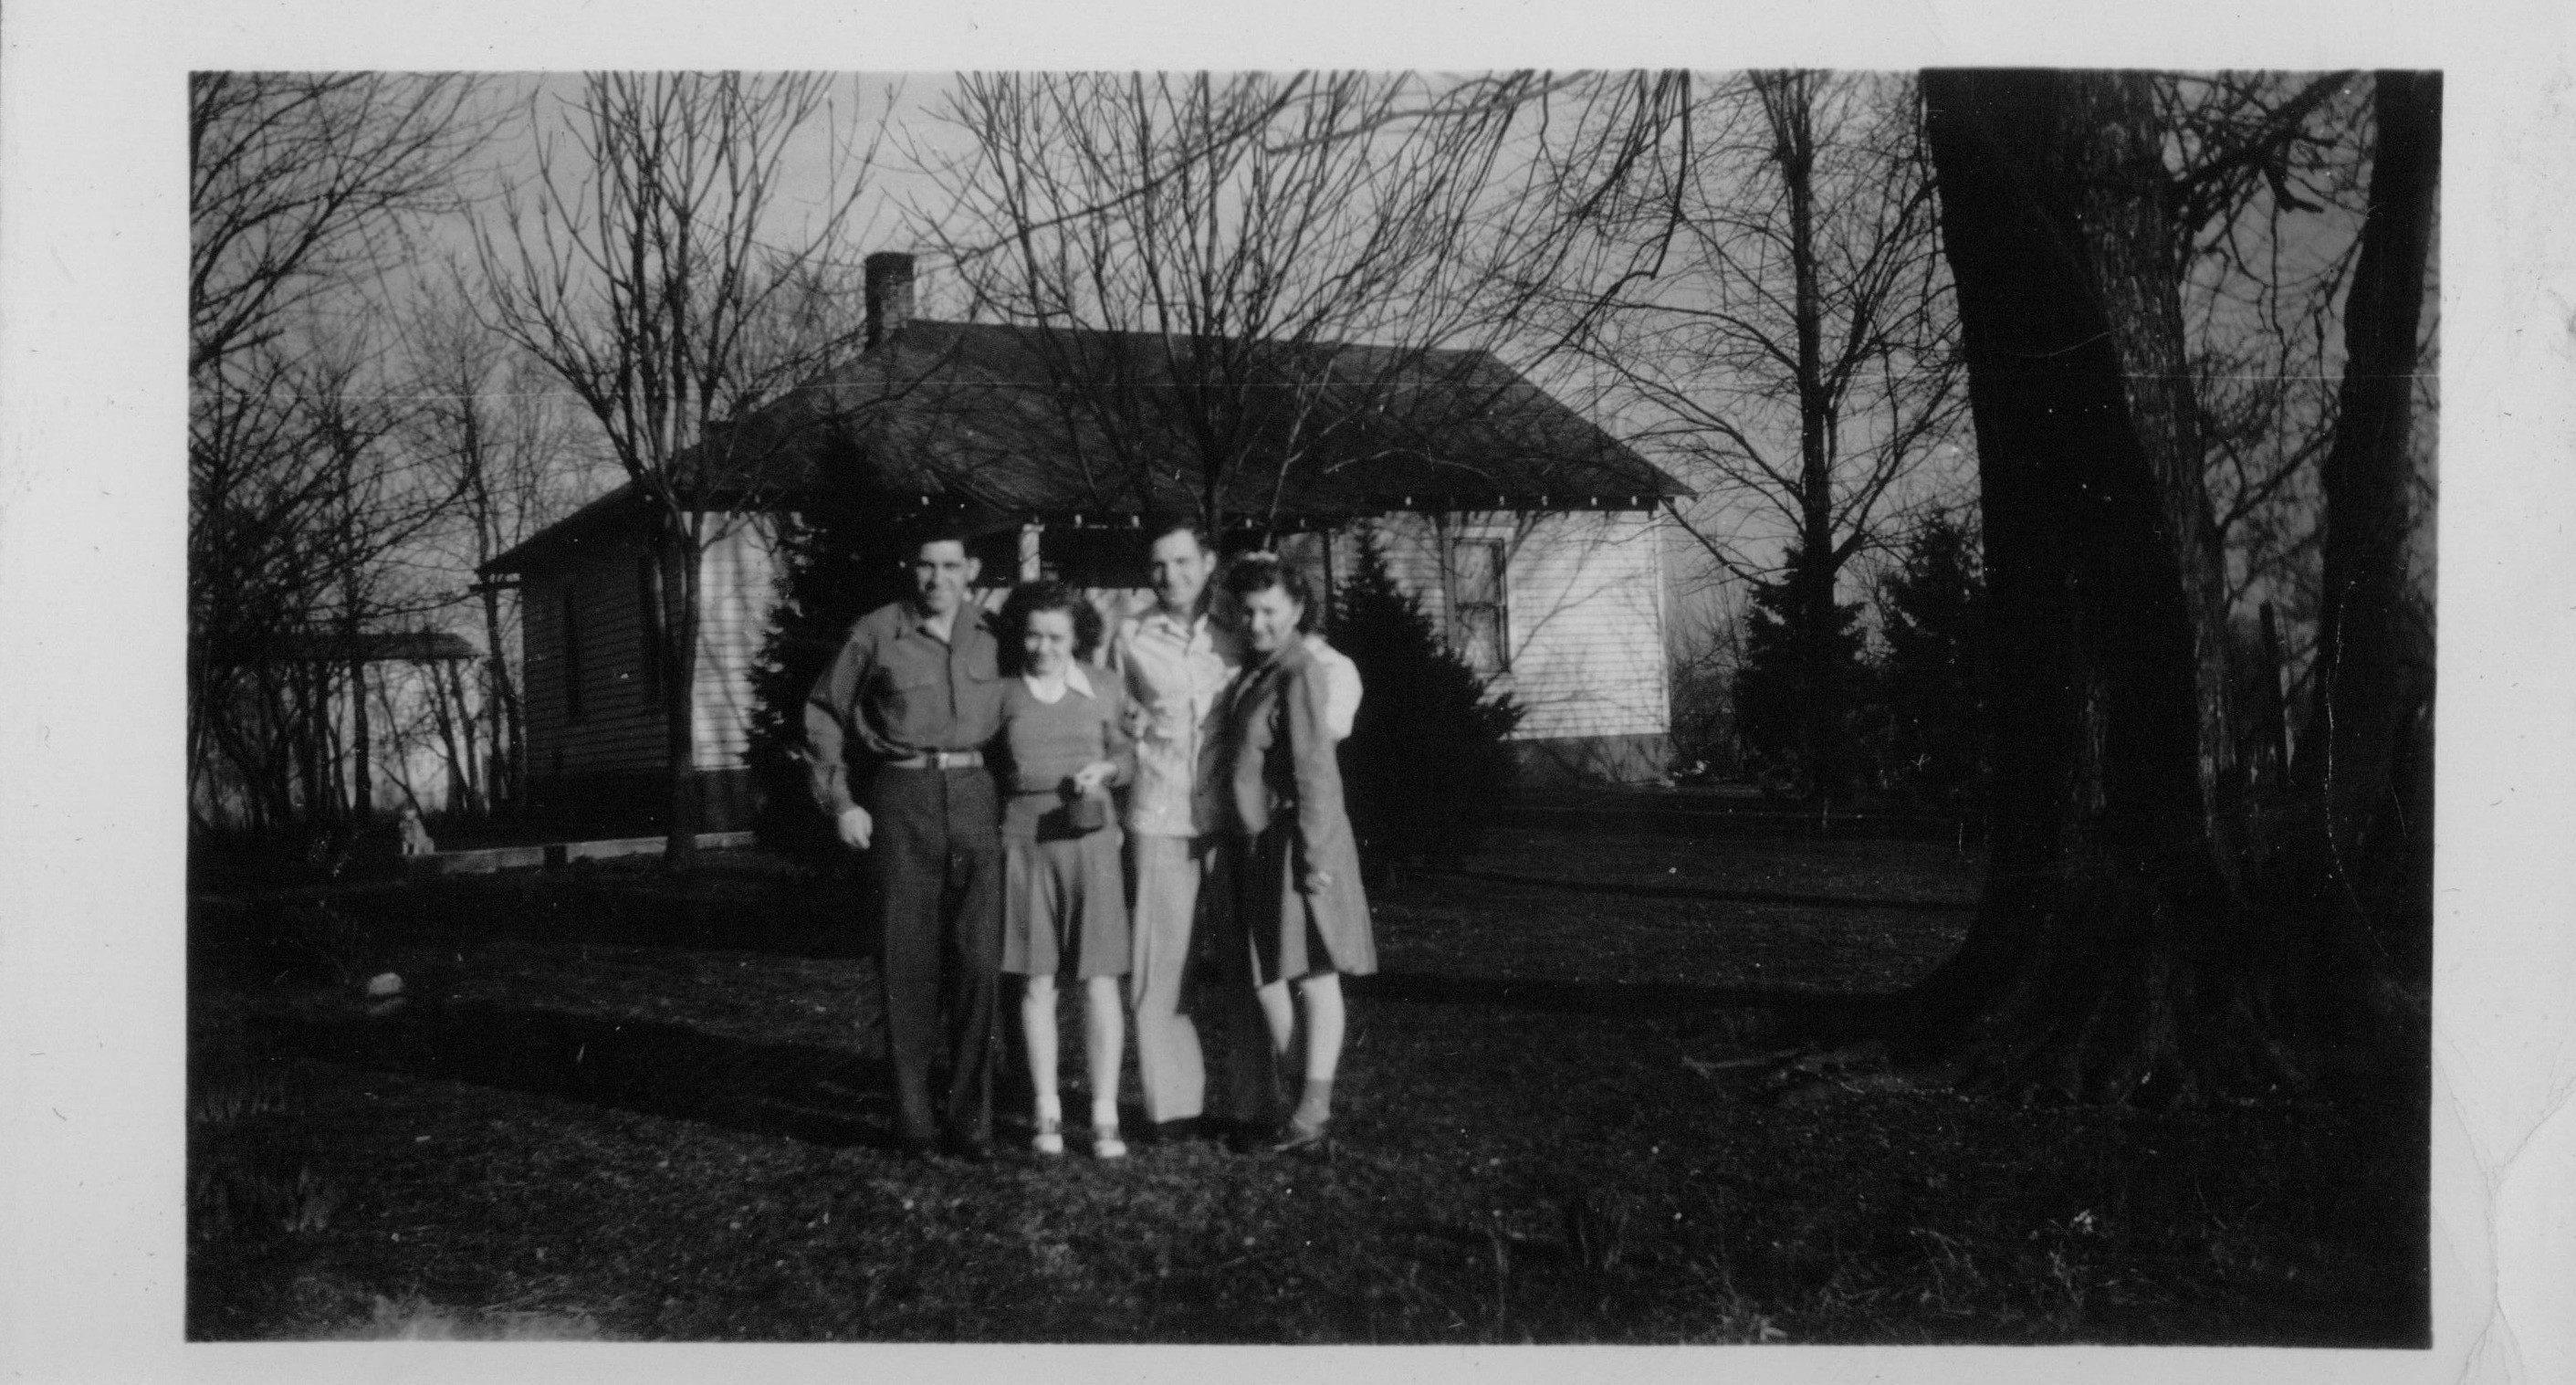 Frank, Tootie, Howard, and Juanita Cheuvront